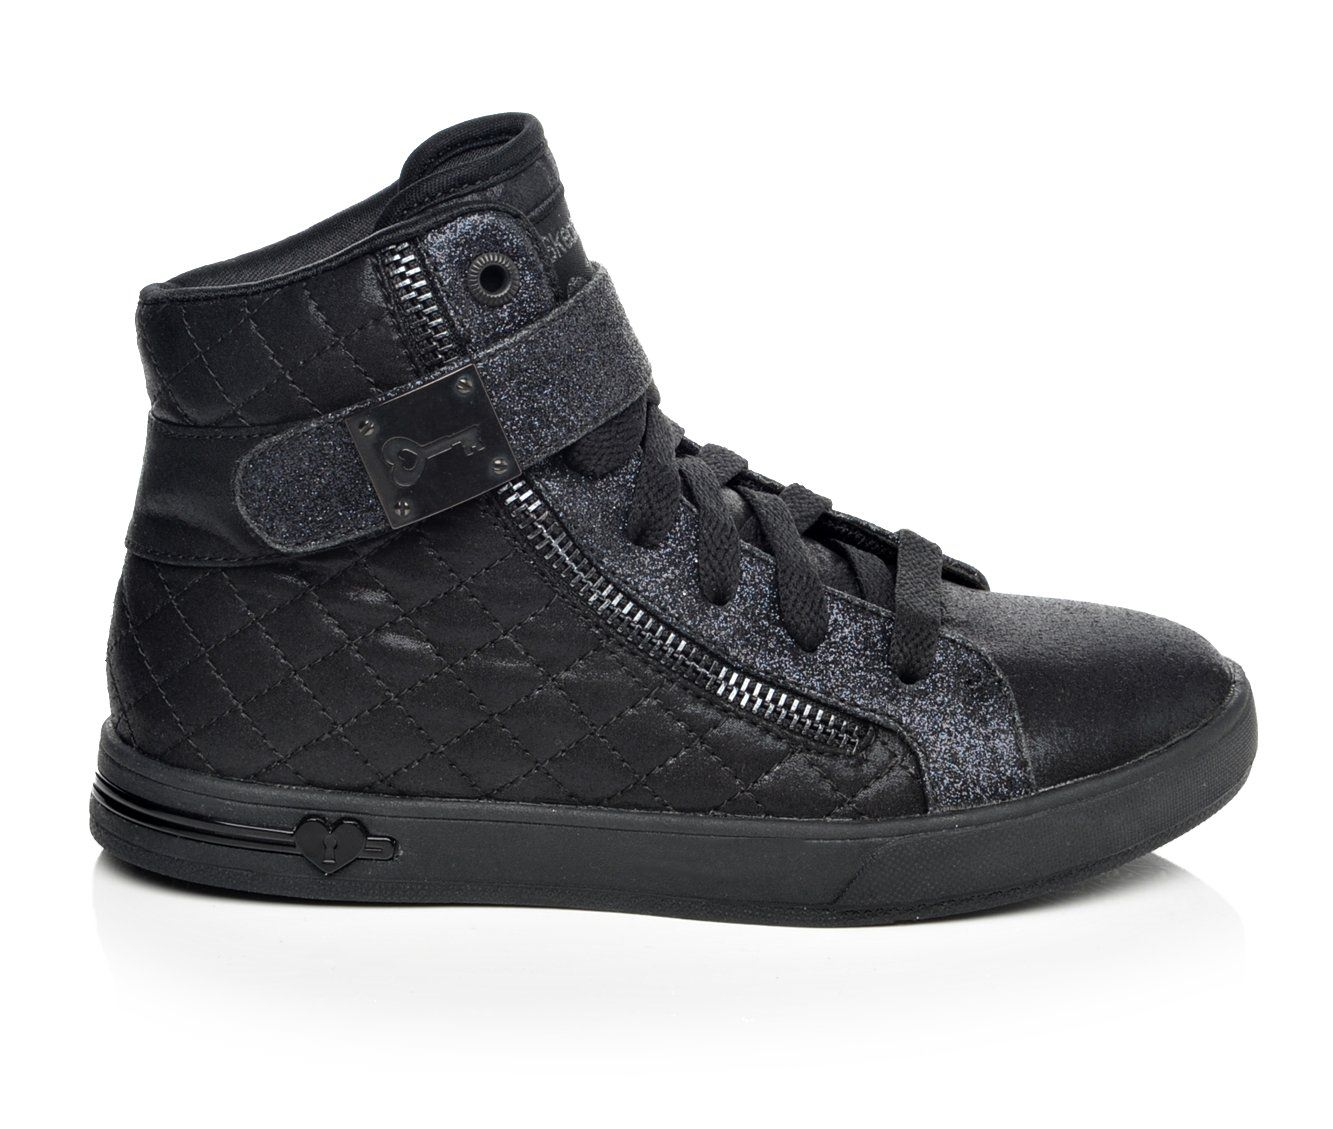 Girls' Skechers Shoutout Quilt Crush Sneakers (Black)